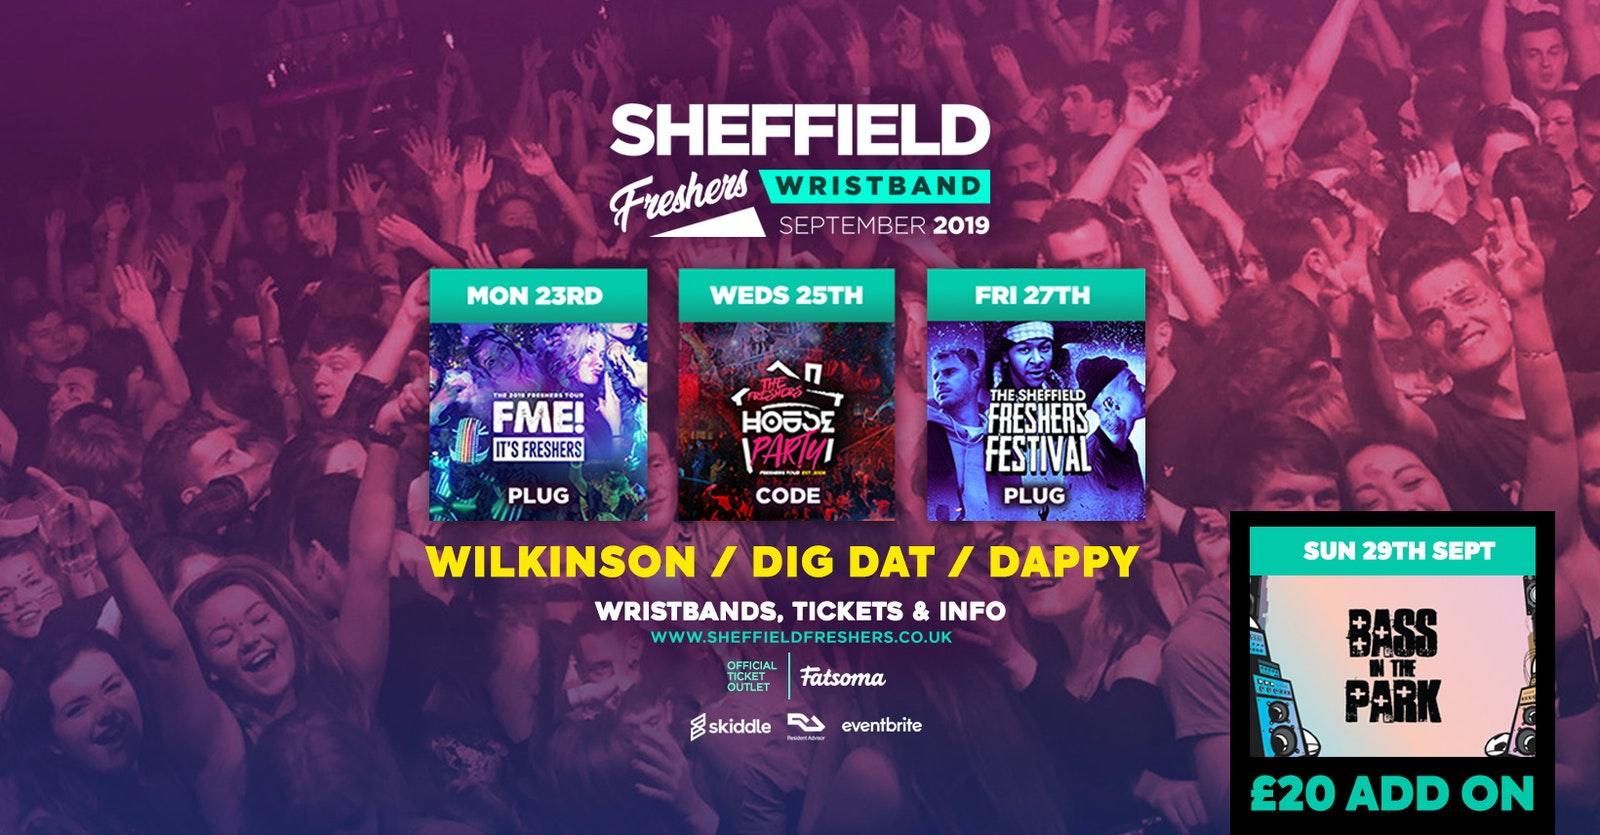 Sheffield Freshers Wristband 2019 ///